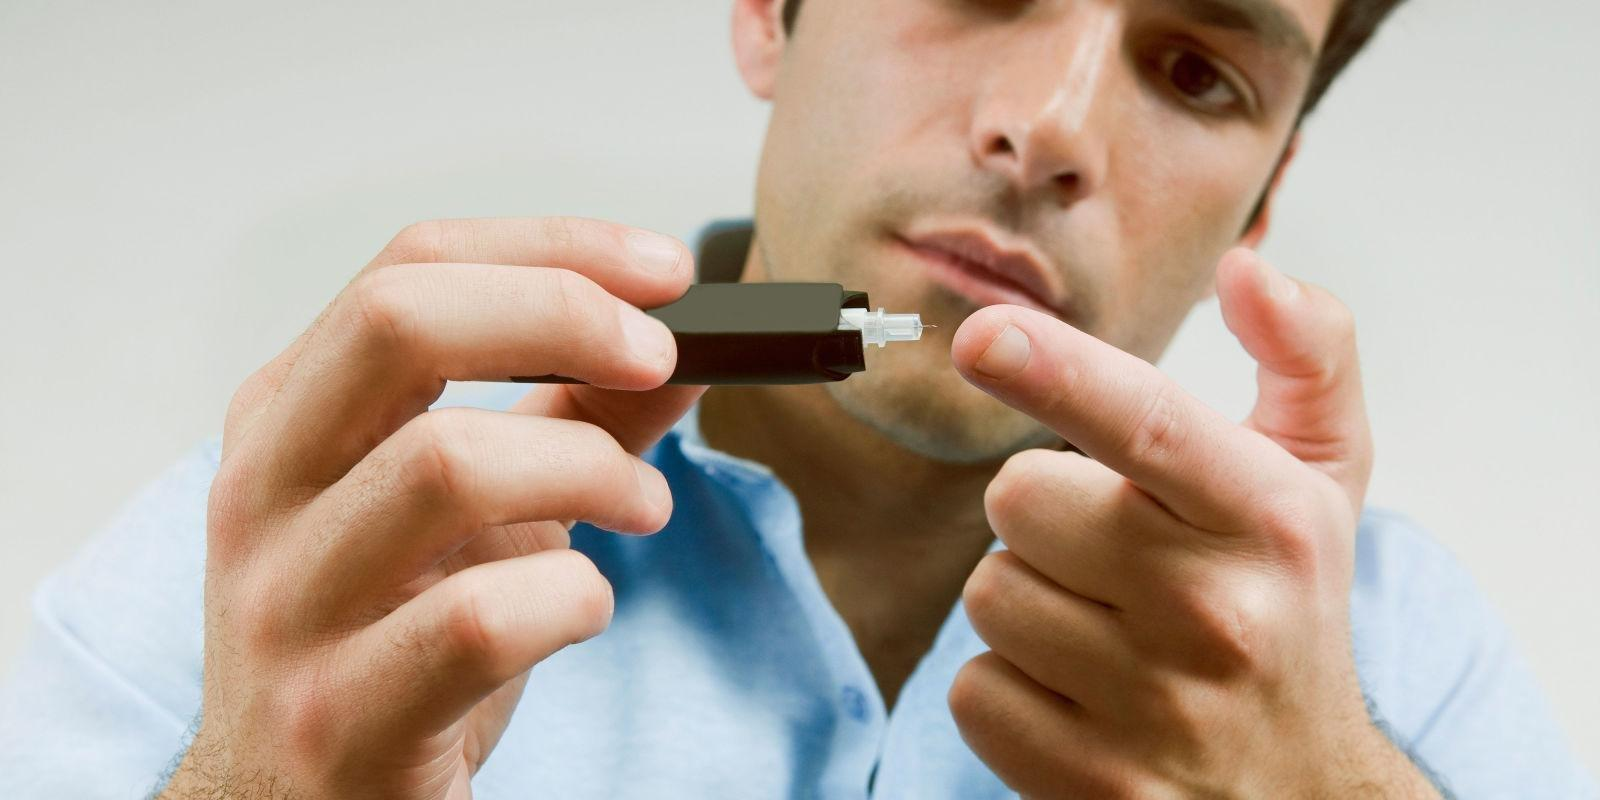 What Happens When You Have Diabetes?